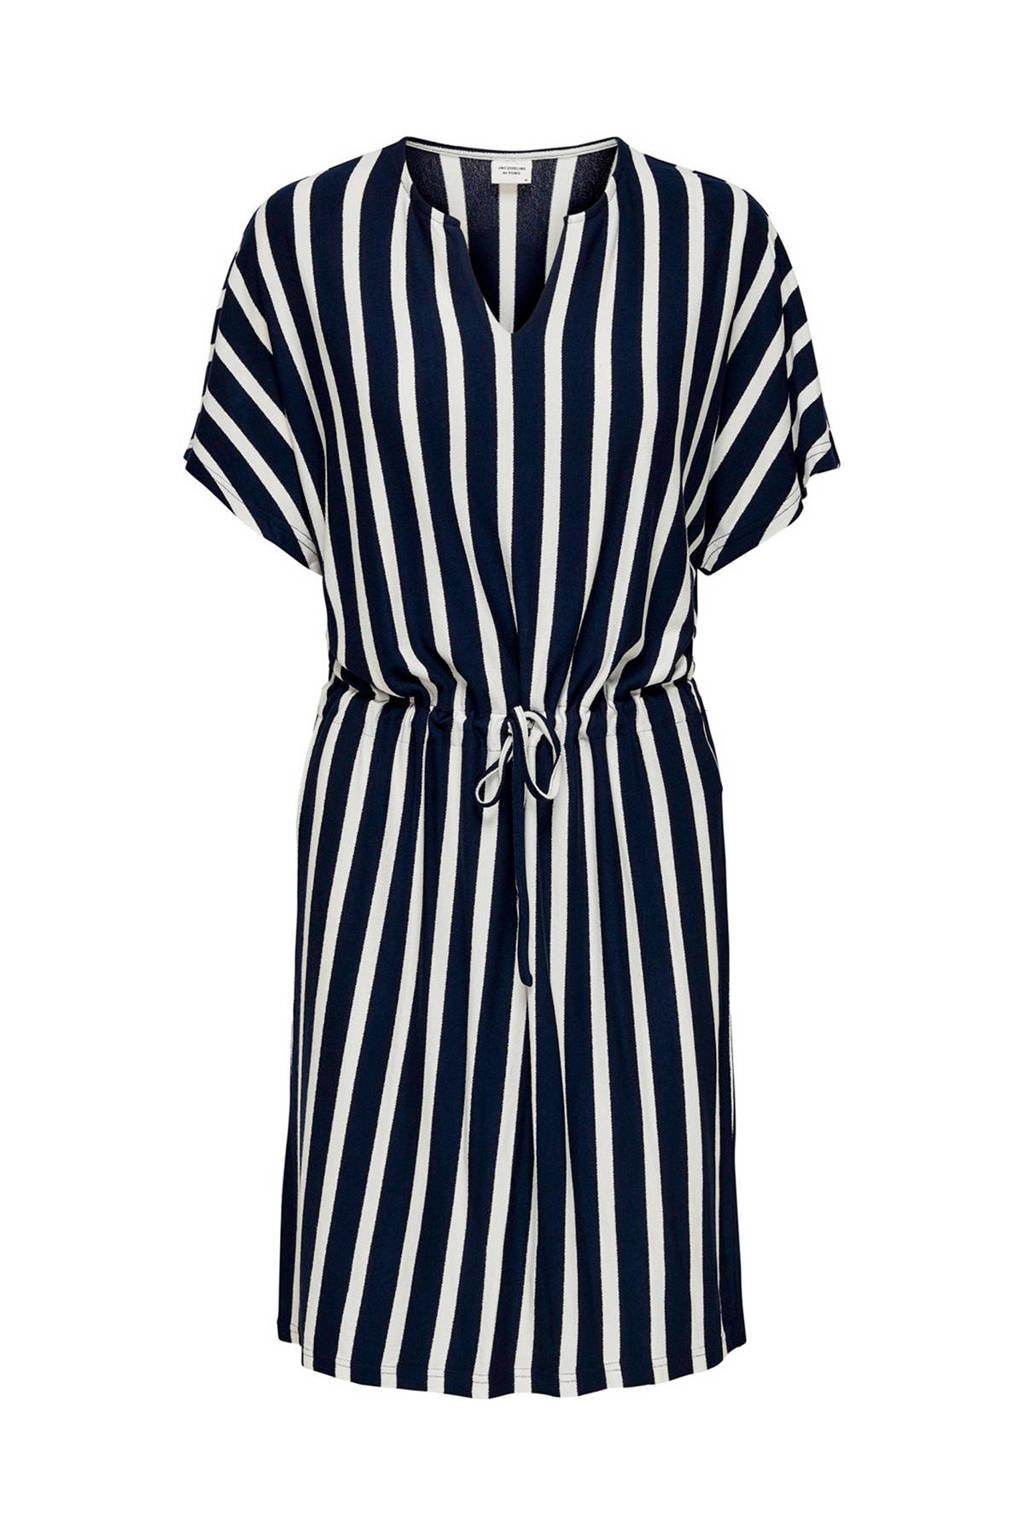 JACQUELINE DE YONG gestreepte jurk, Donkerblauw